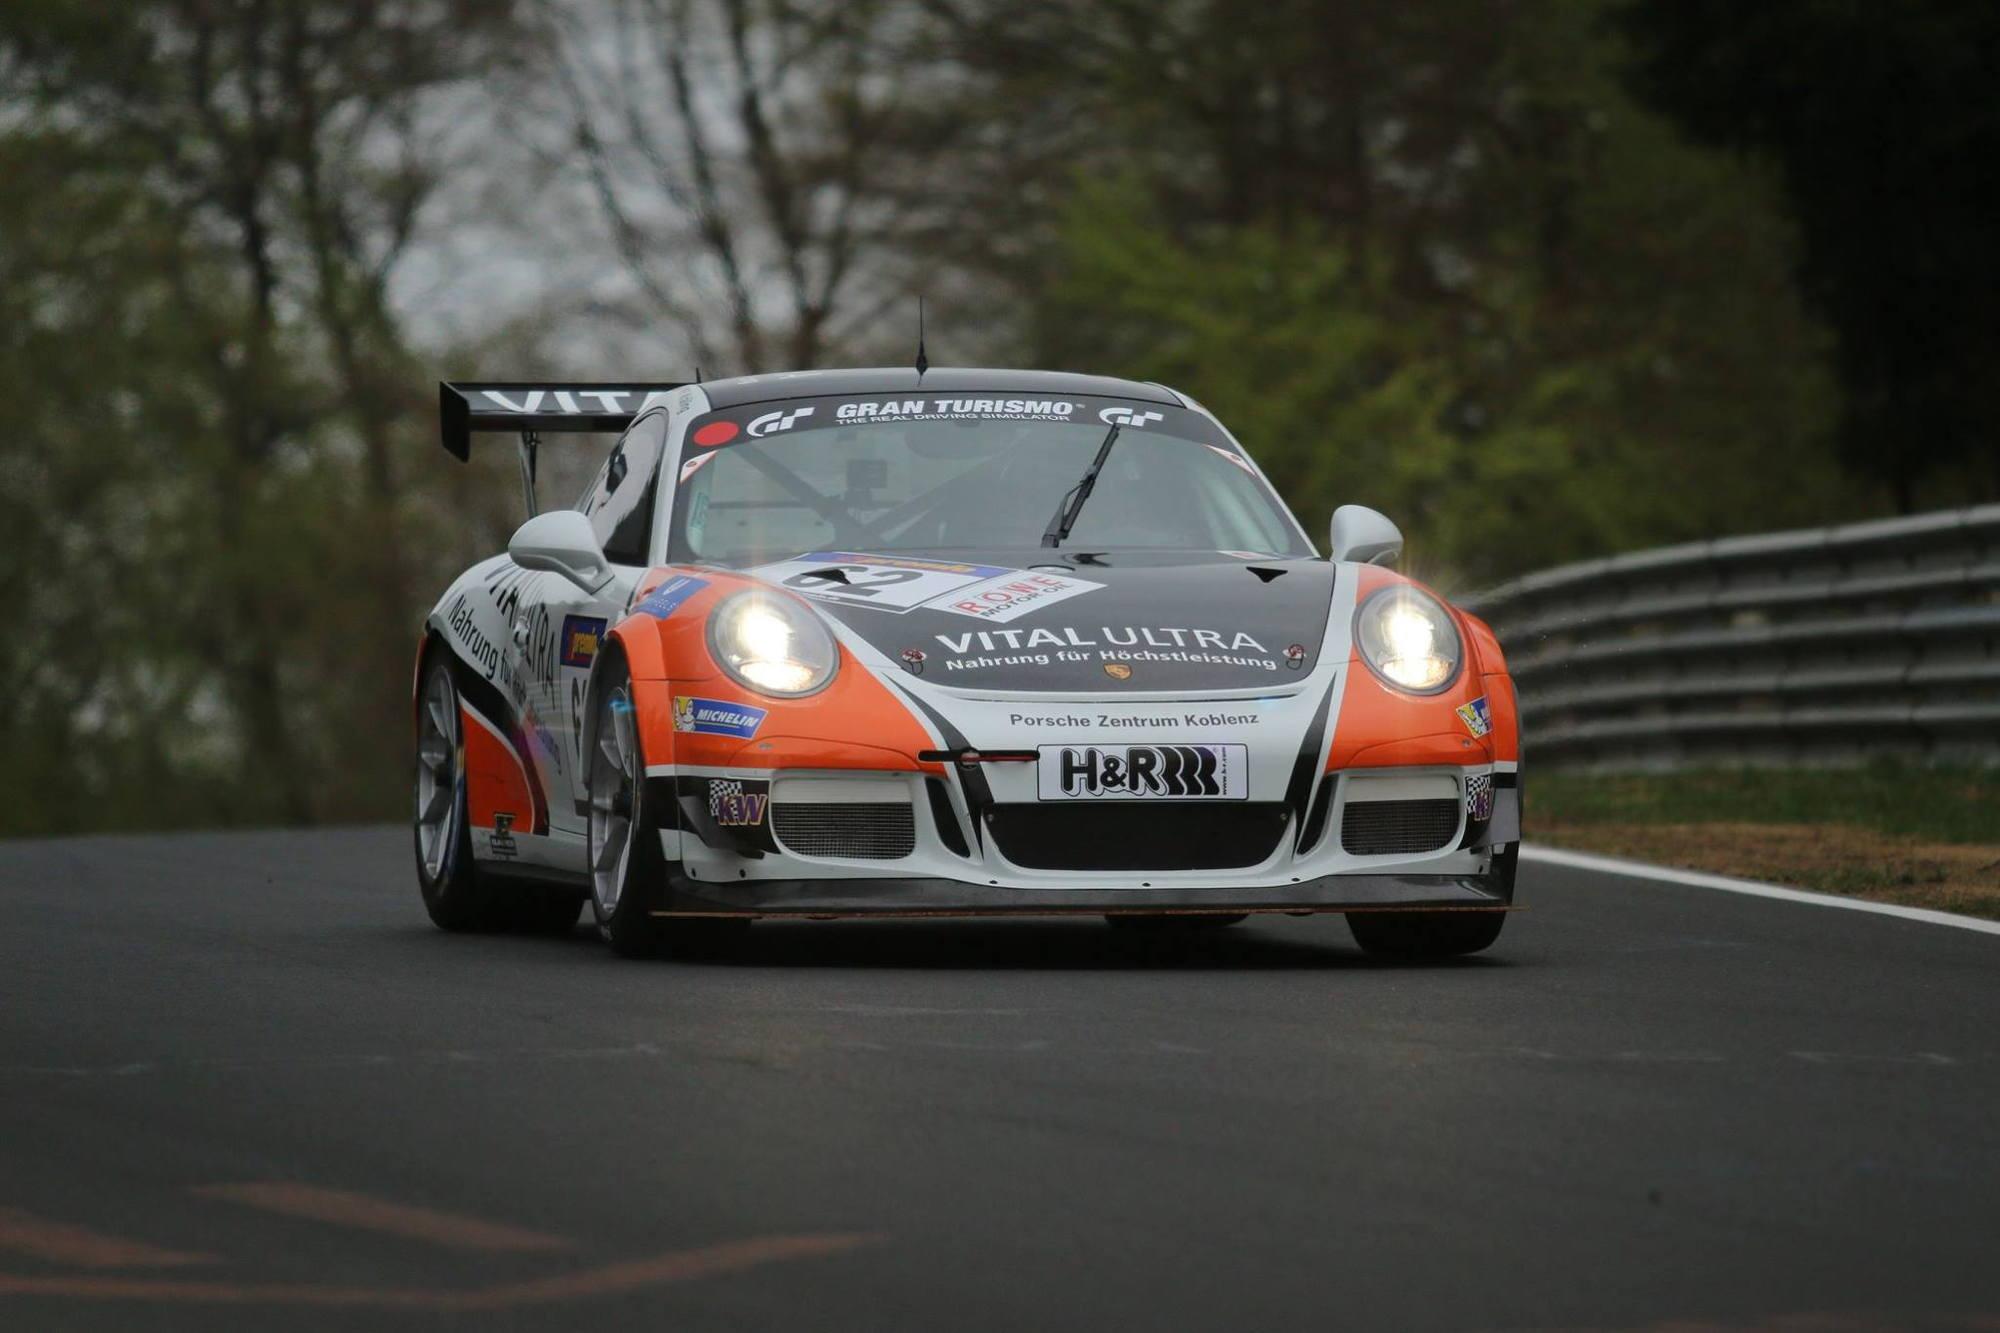 Ka motorsport 991 gt3 cup widebody rennlist porsche for Porsche ka che